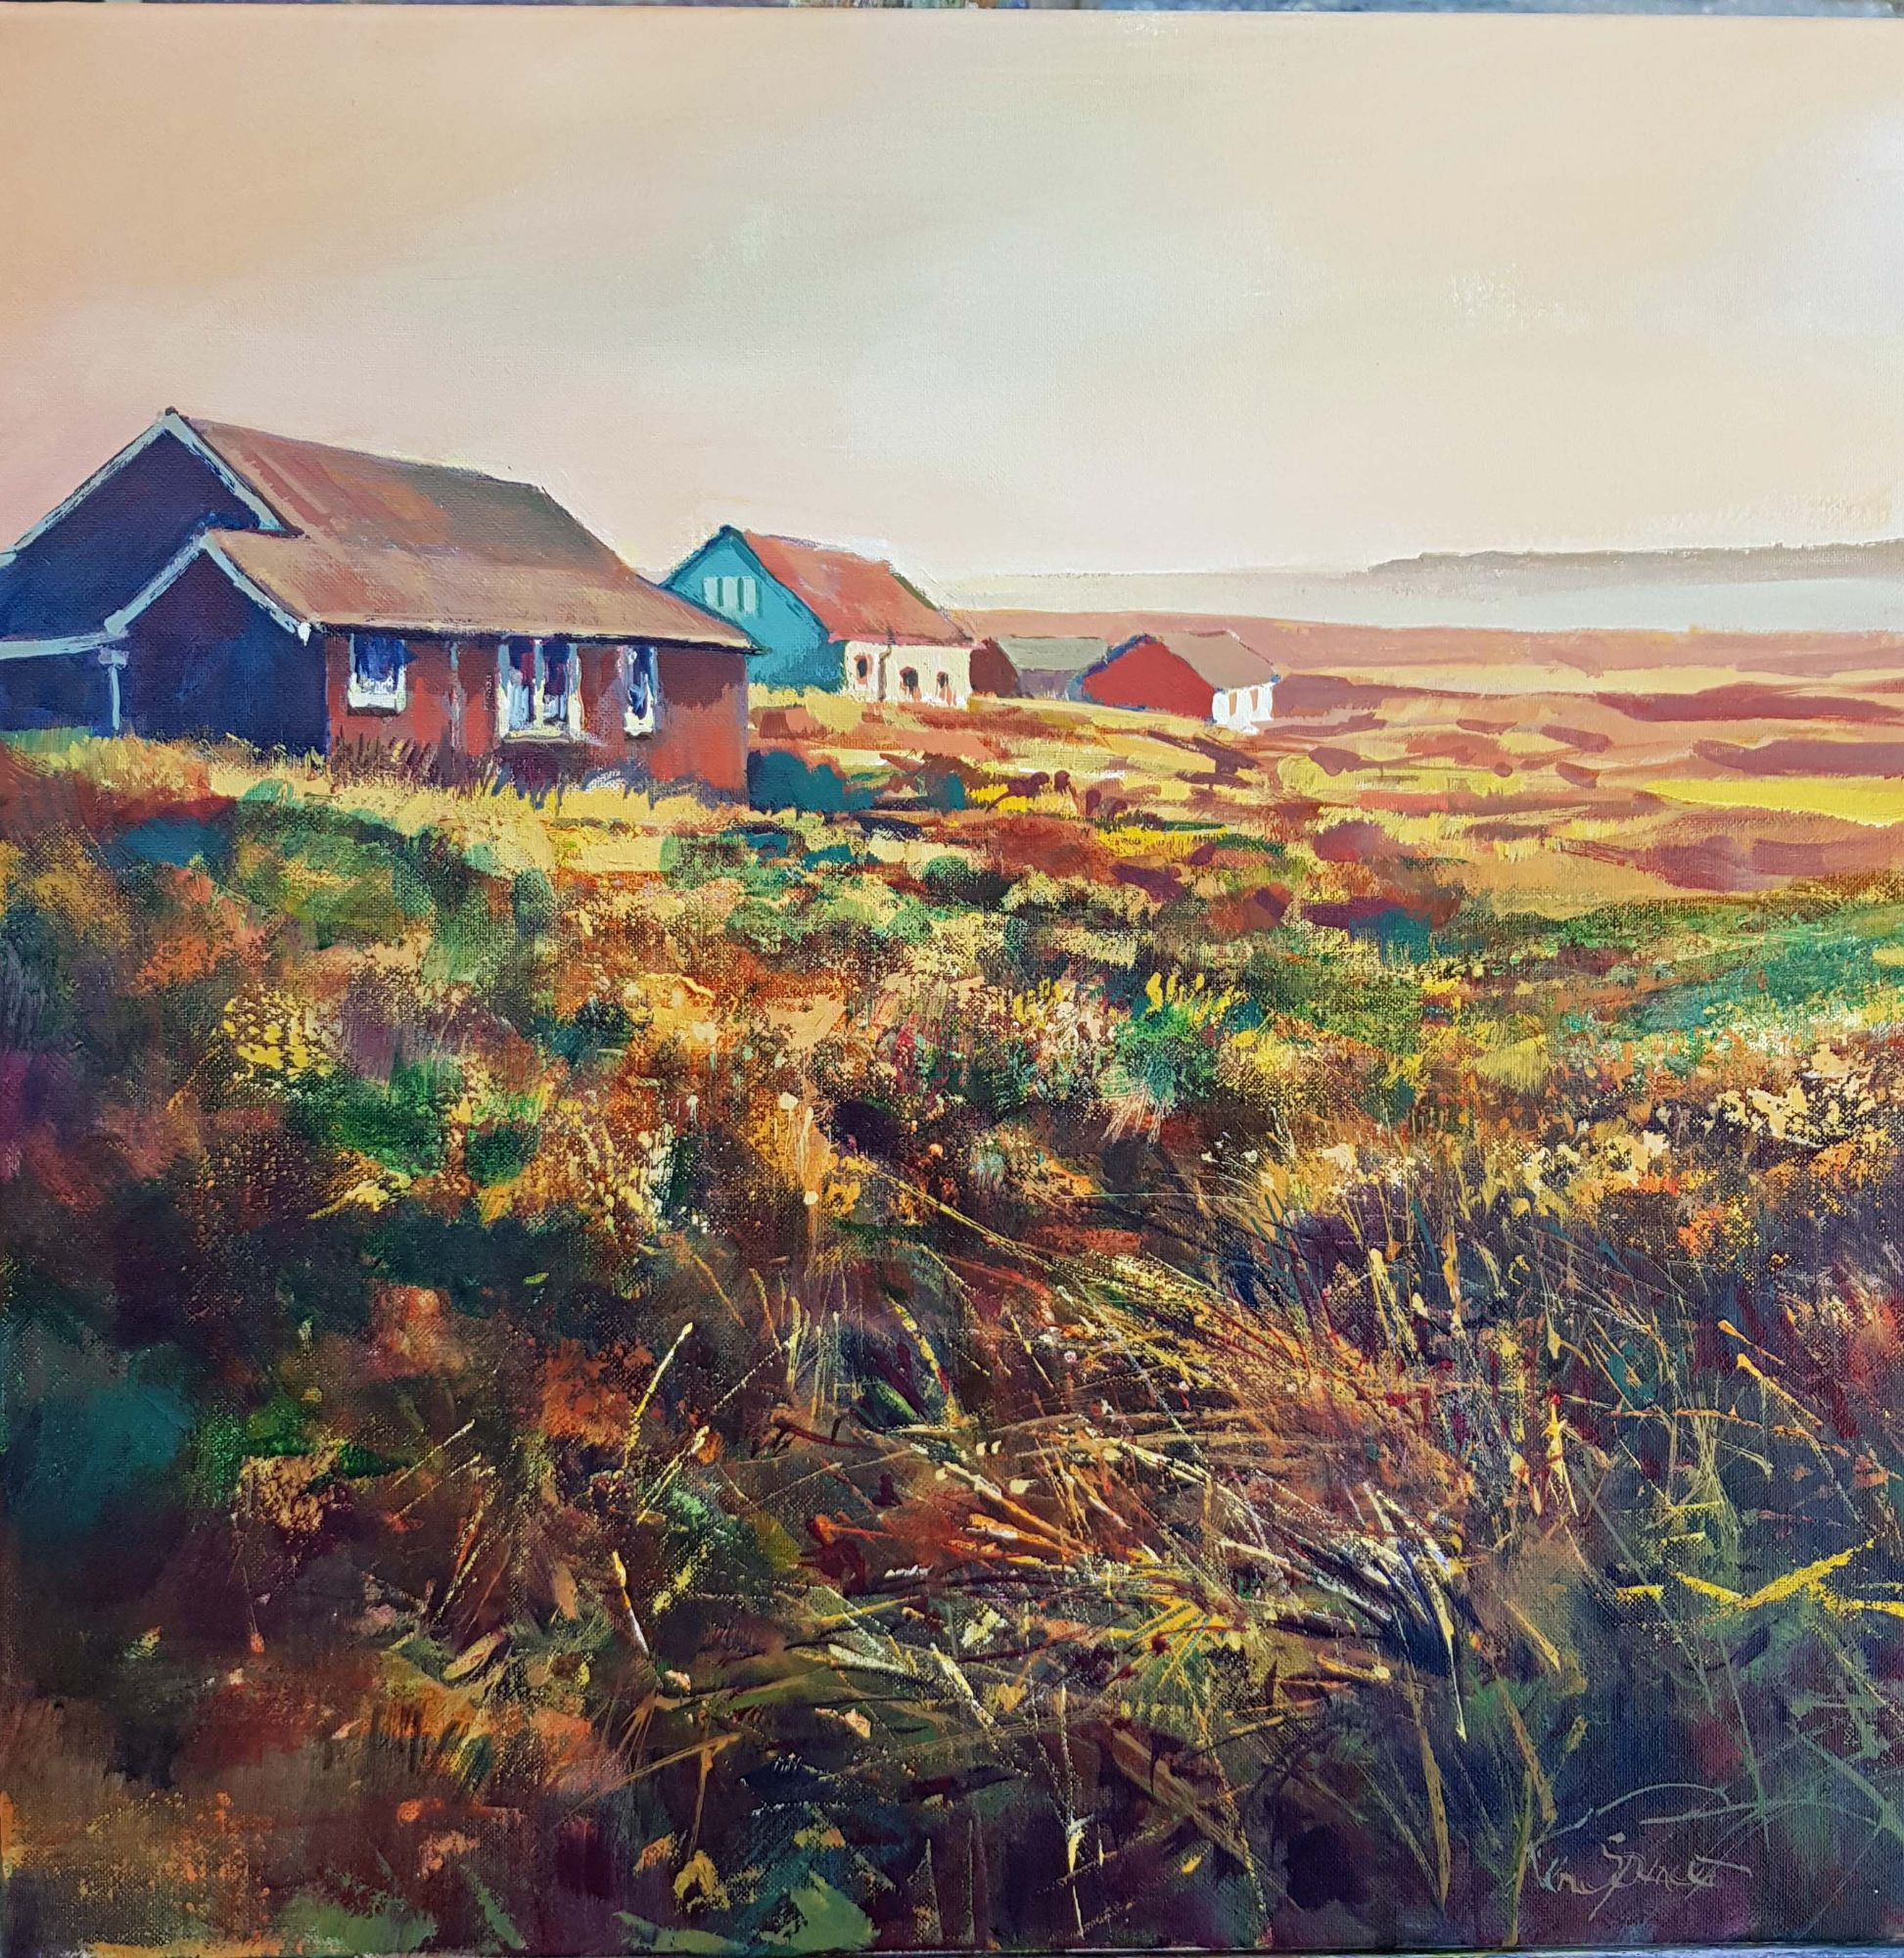 Dune chalets, Embleton 40 x 40 cms£195